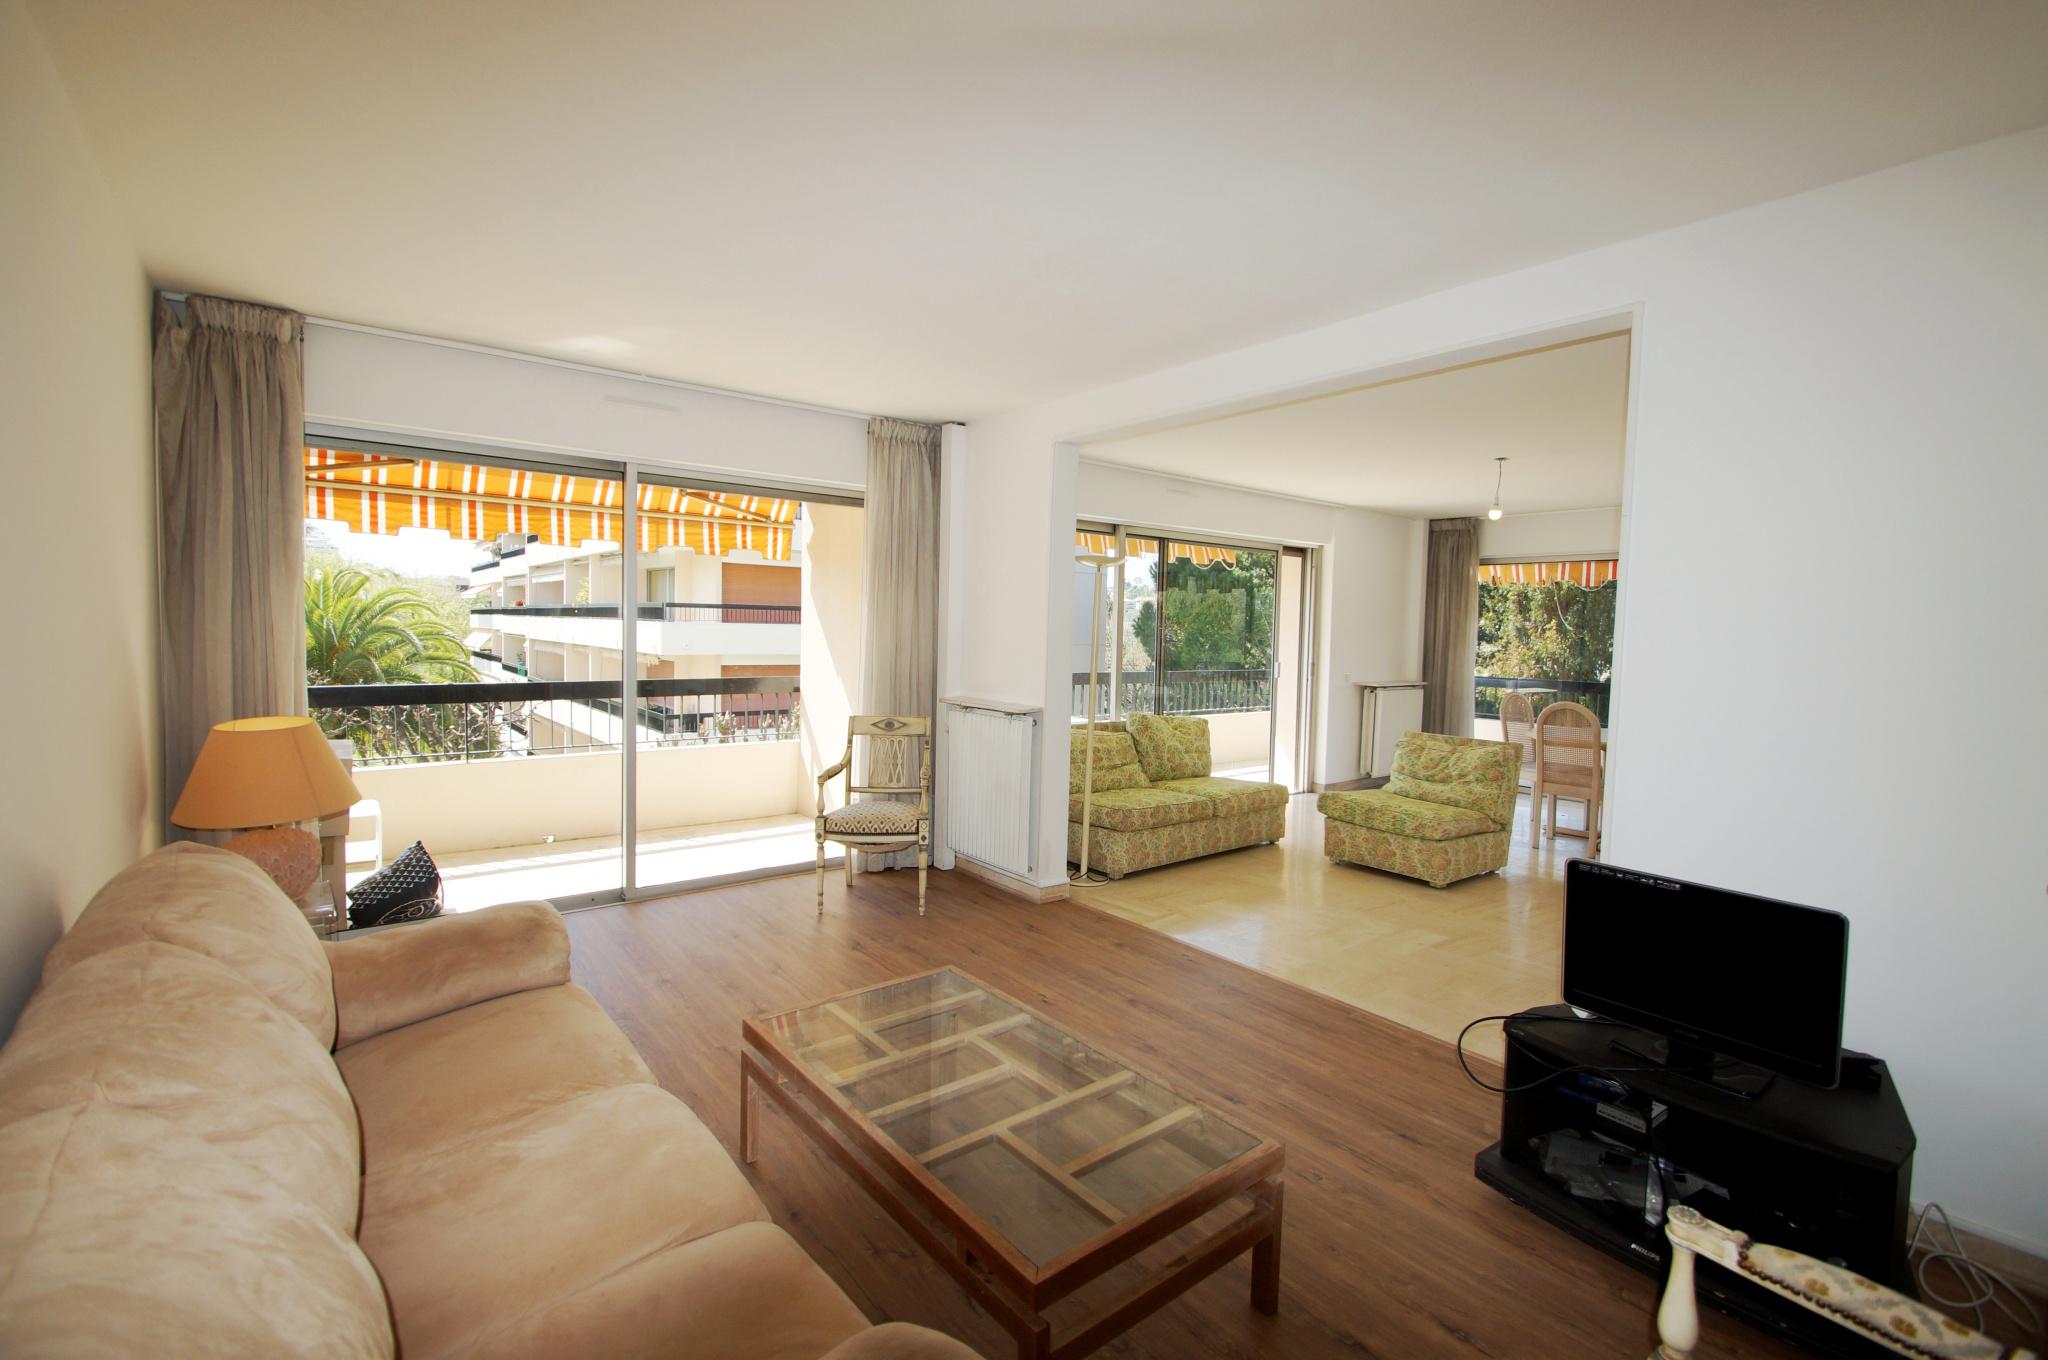 VILLENEUVE LOUBET - NEAR THE SEA - 3 / 4P of 90m2 in a luxury residence